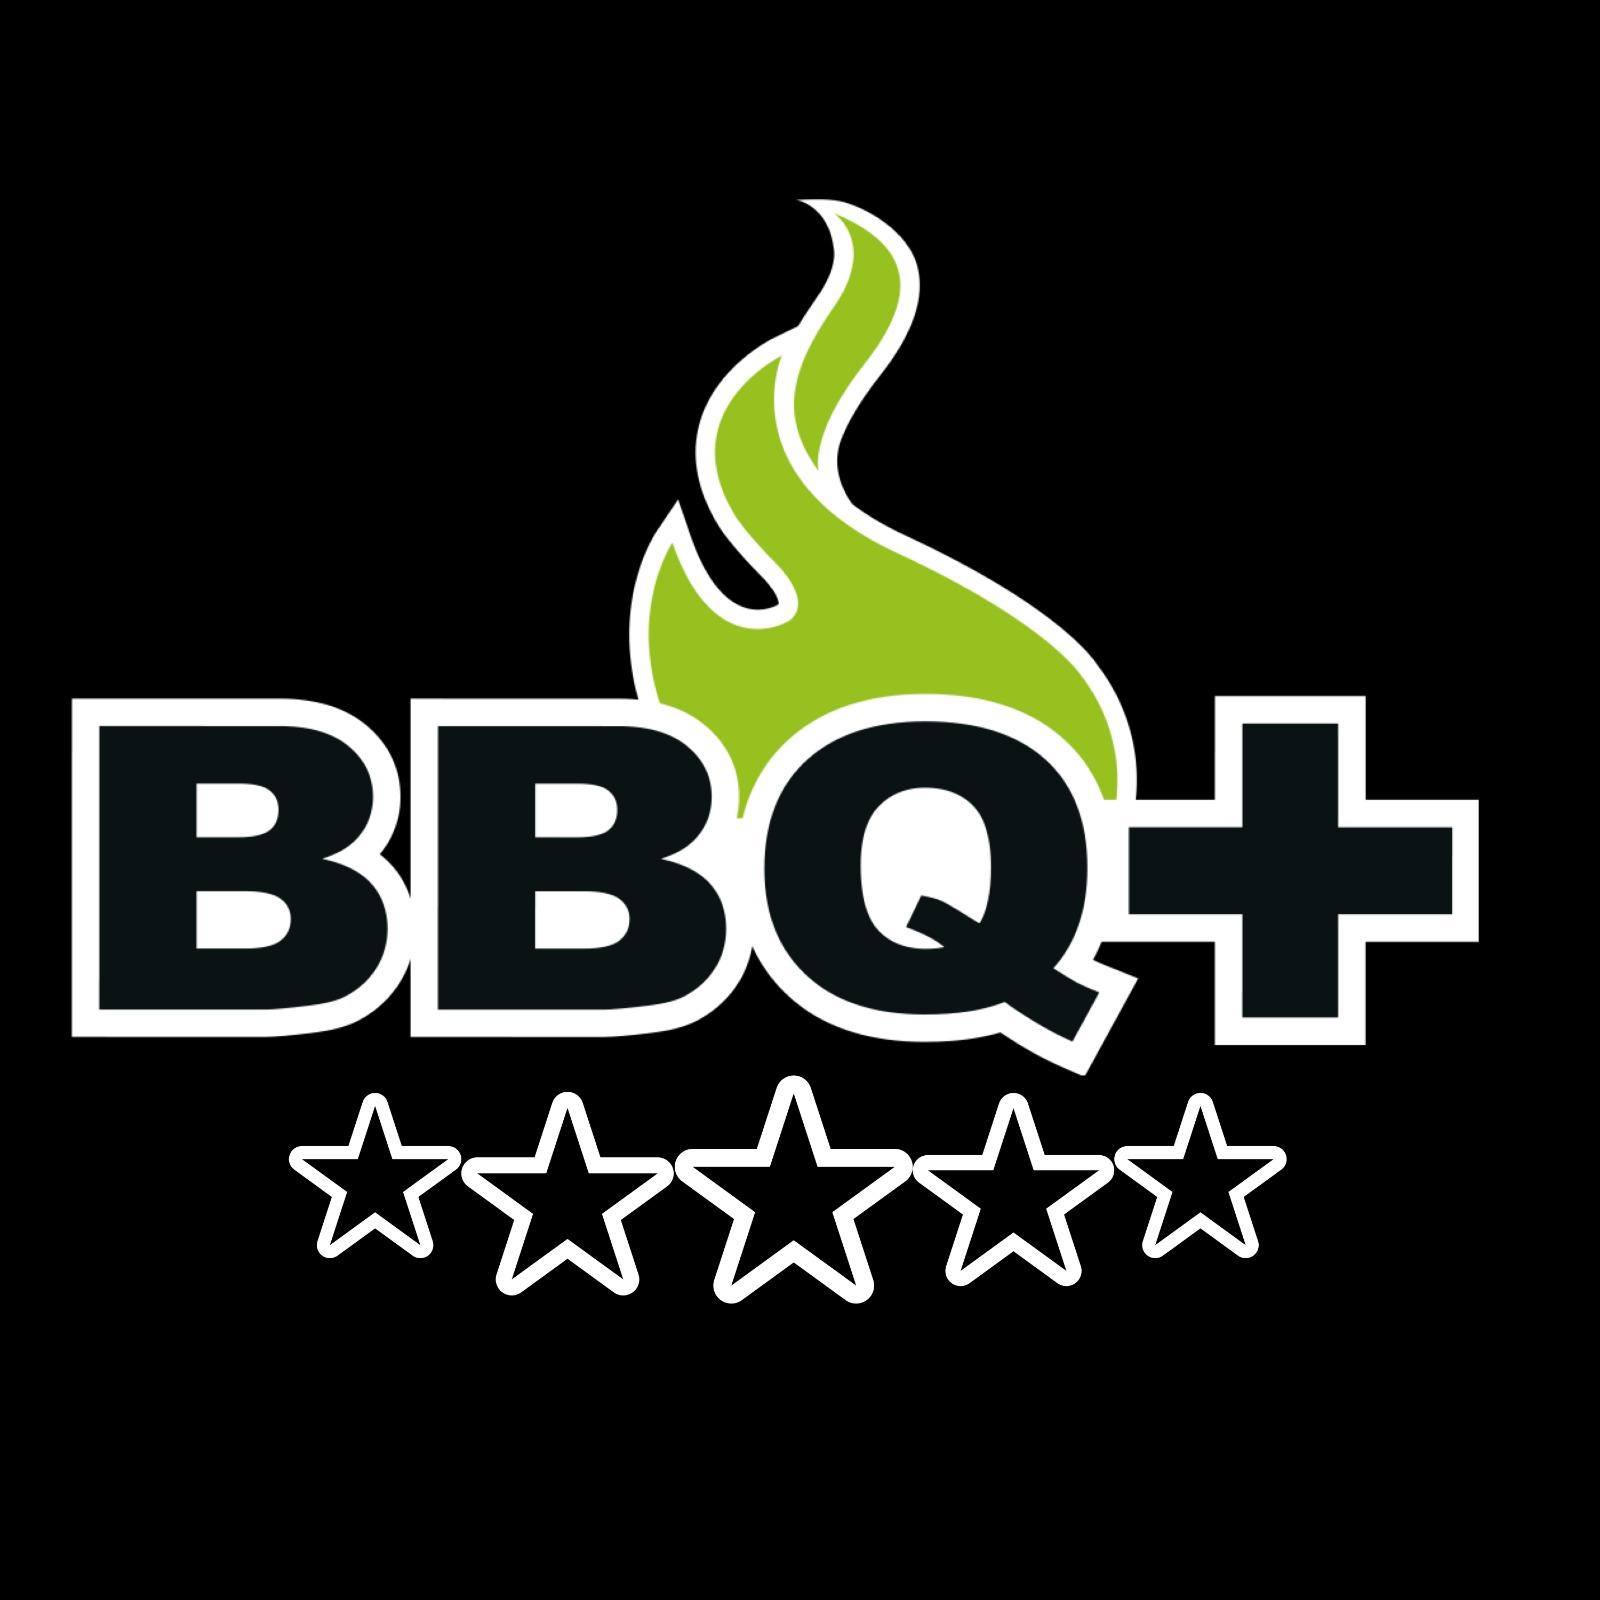 https://dealershop.resaco.nl/wp-content/uploads/2021/07/BBQ-logo.jpg